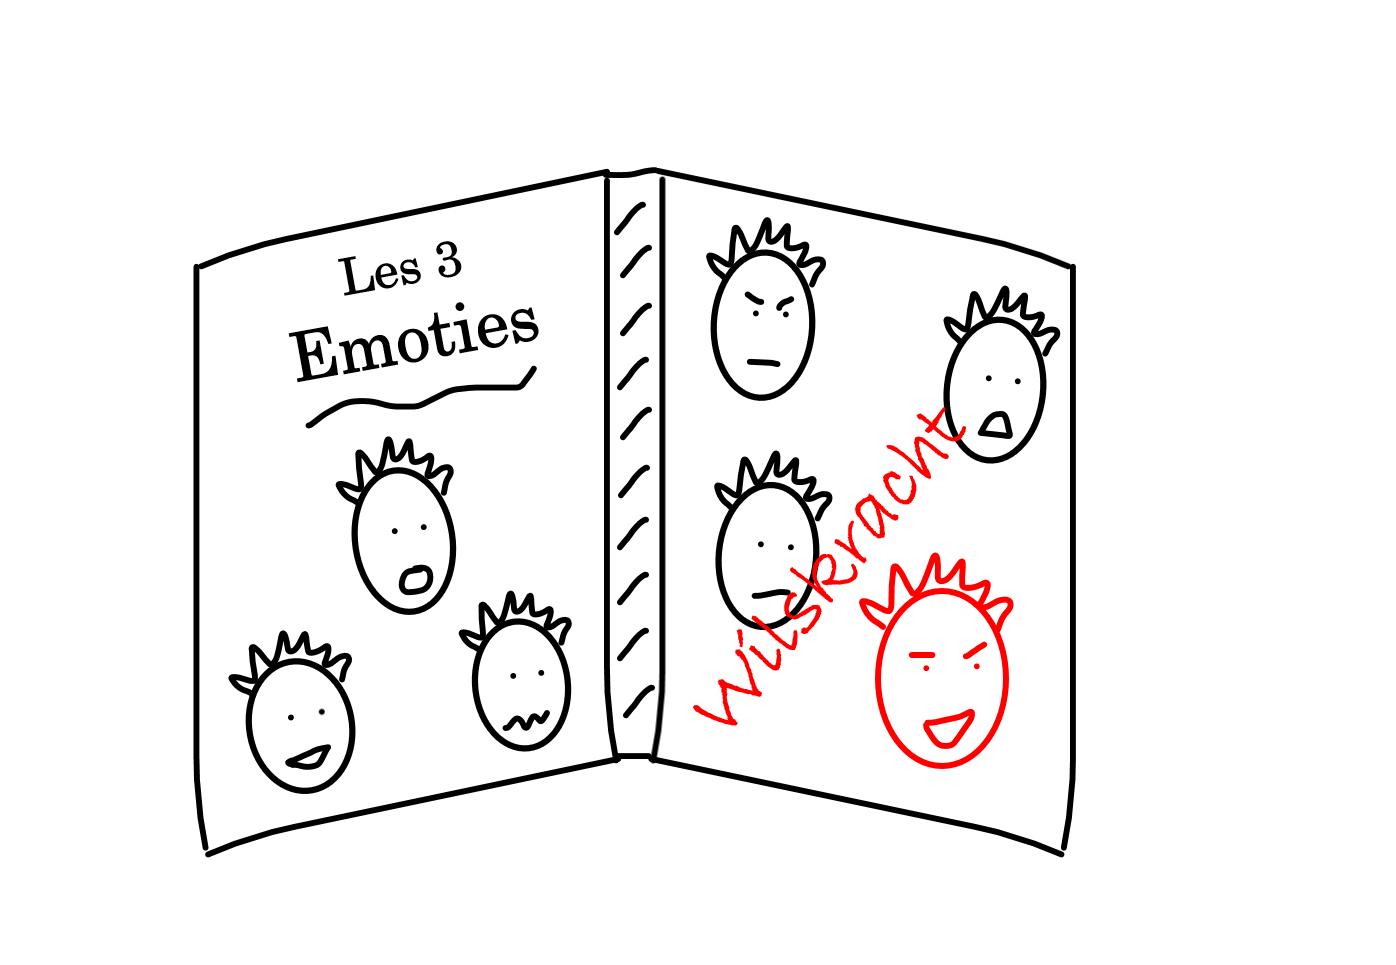 les 3 emoties met witte achtergrond